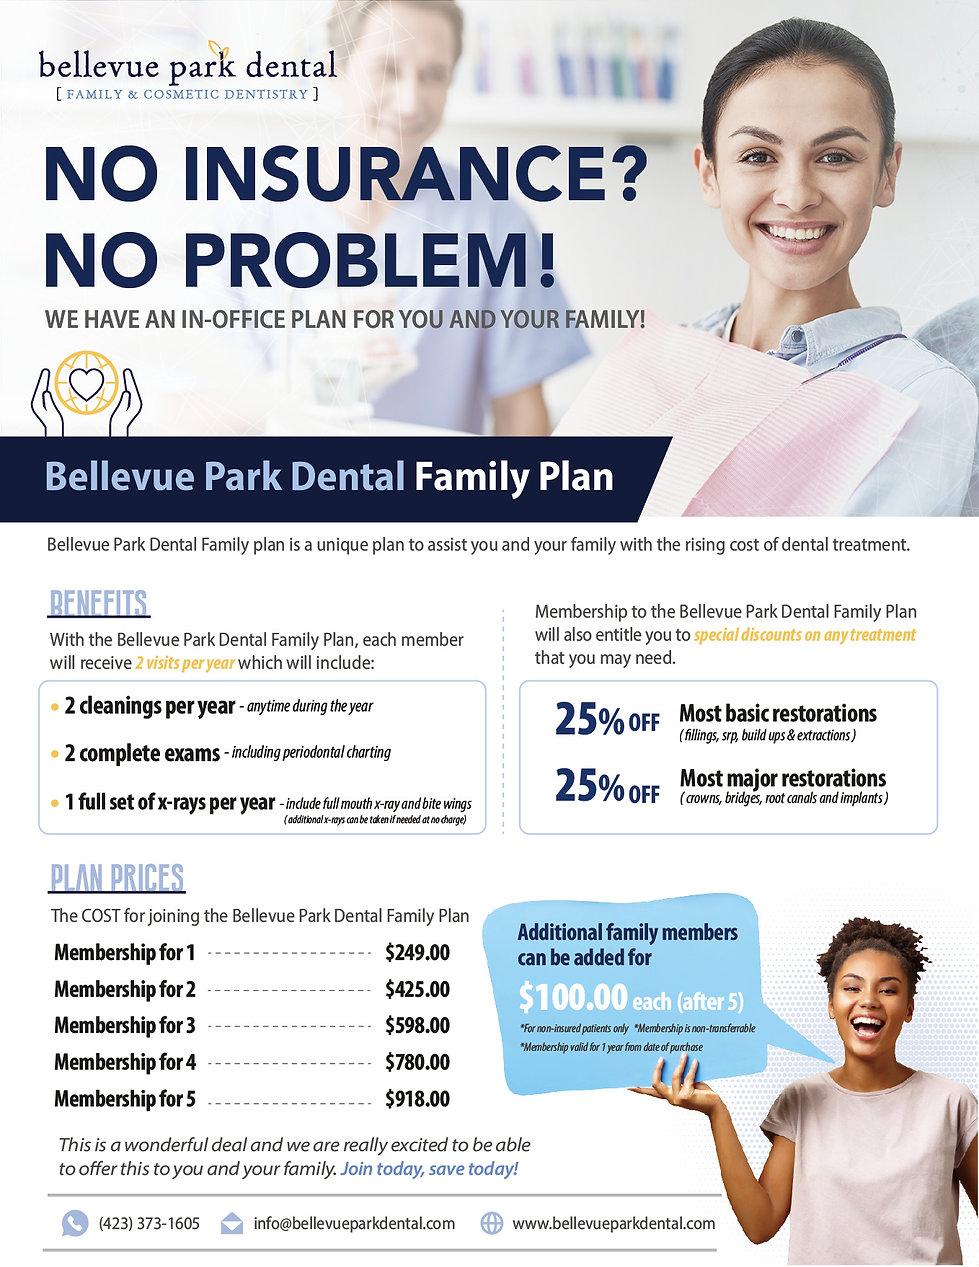 Bellevue Park Dental_Dental Membership P